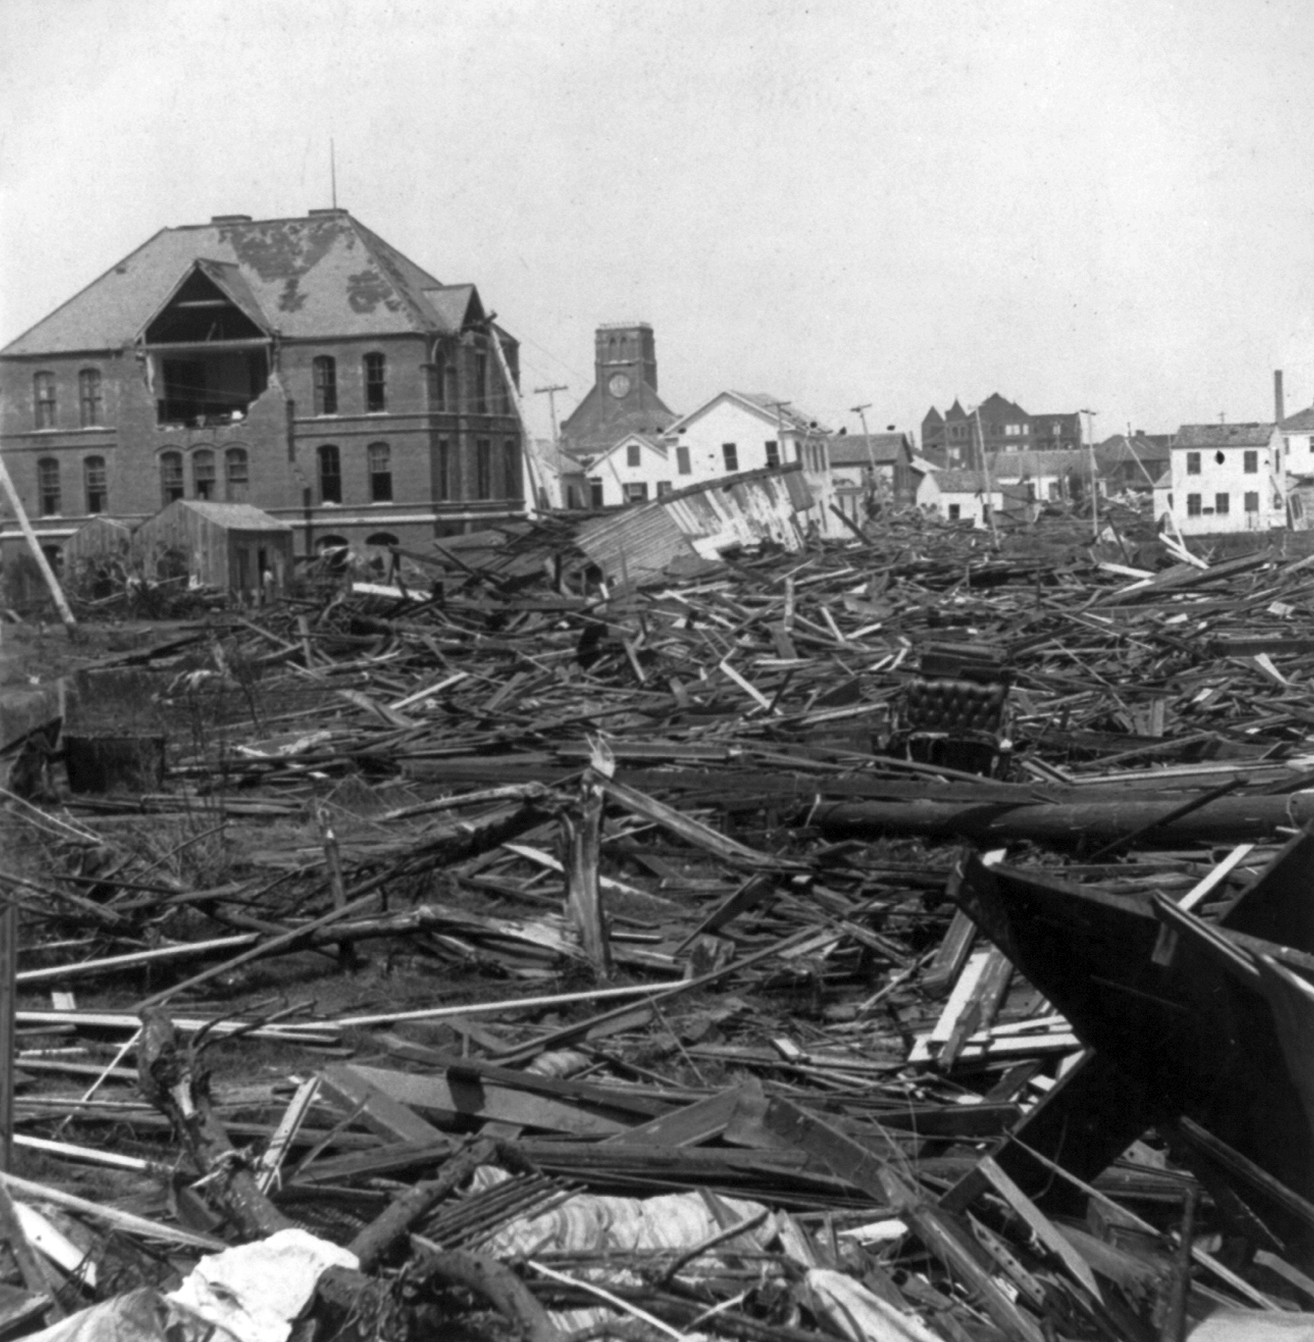 File:Wrecked Negro High School Building, Galveston, Texas.jpg